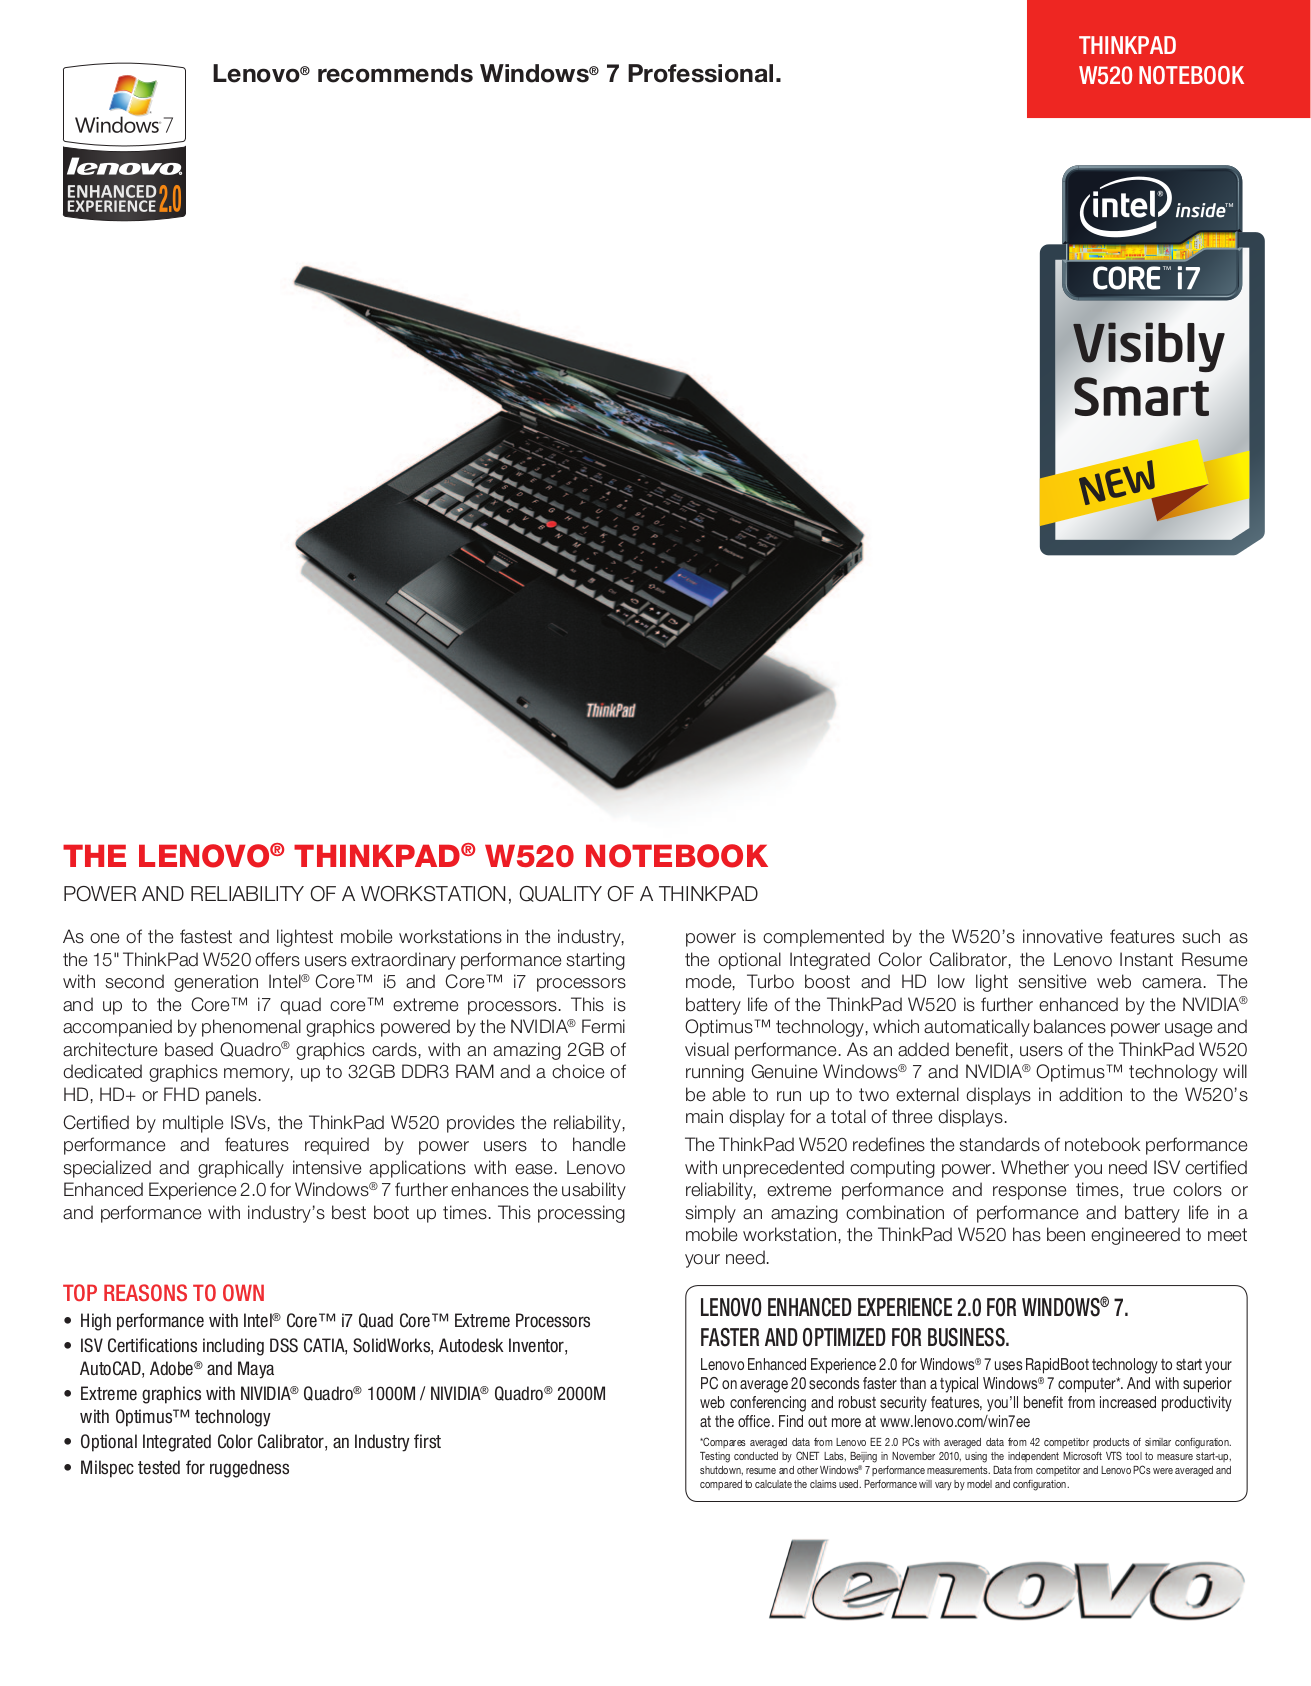 lenovo w520 service manual open source user manual u2022 rh dramatic varieties com lenovo w520 maintenance manual lenovo w520 repair manual